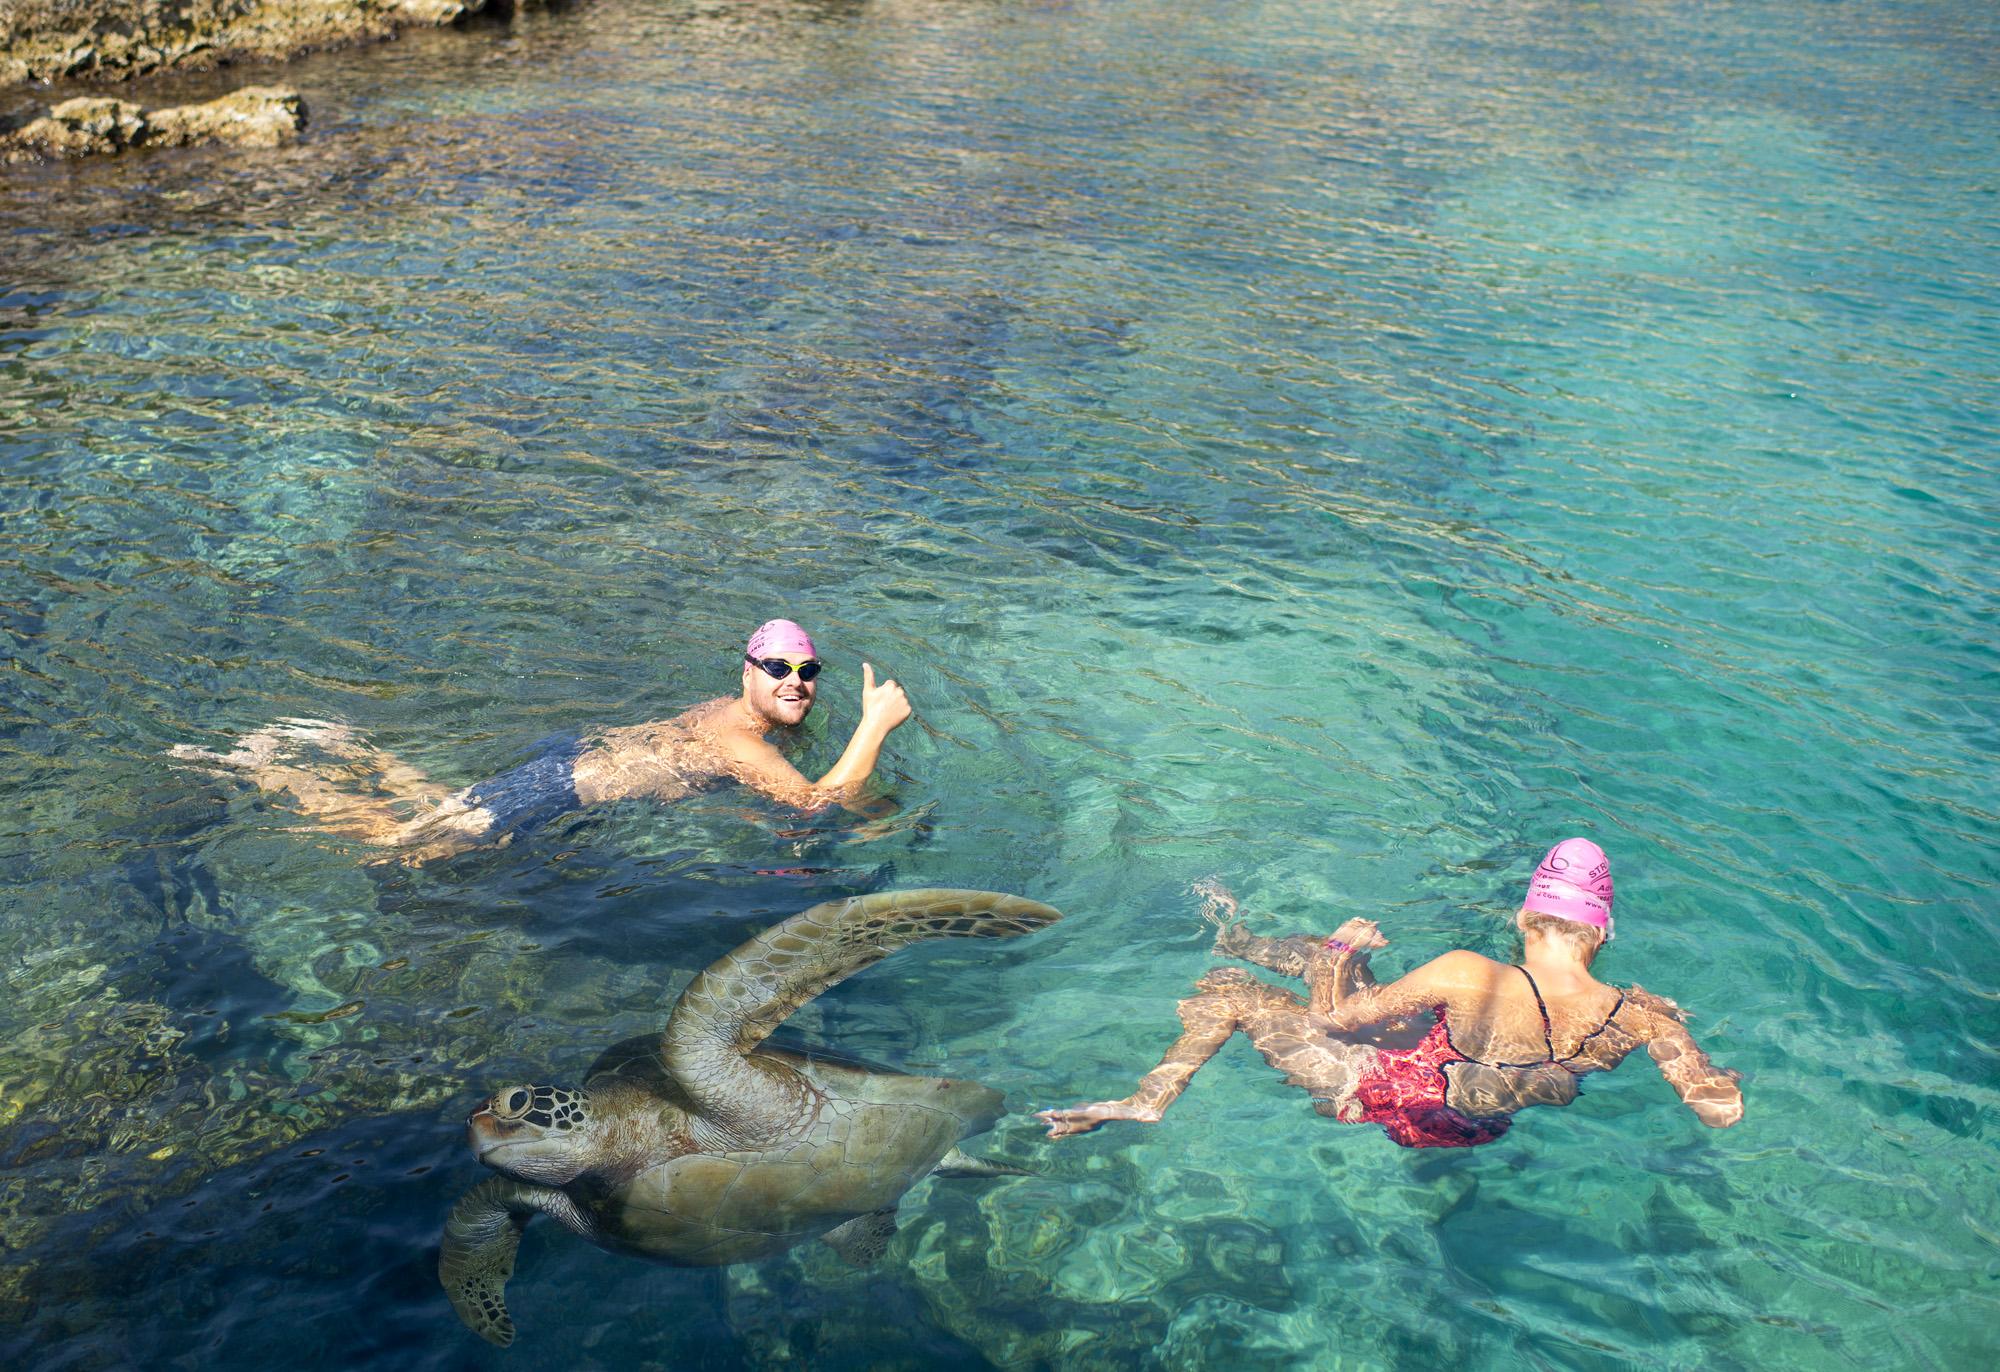 Swimming in Turkey